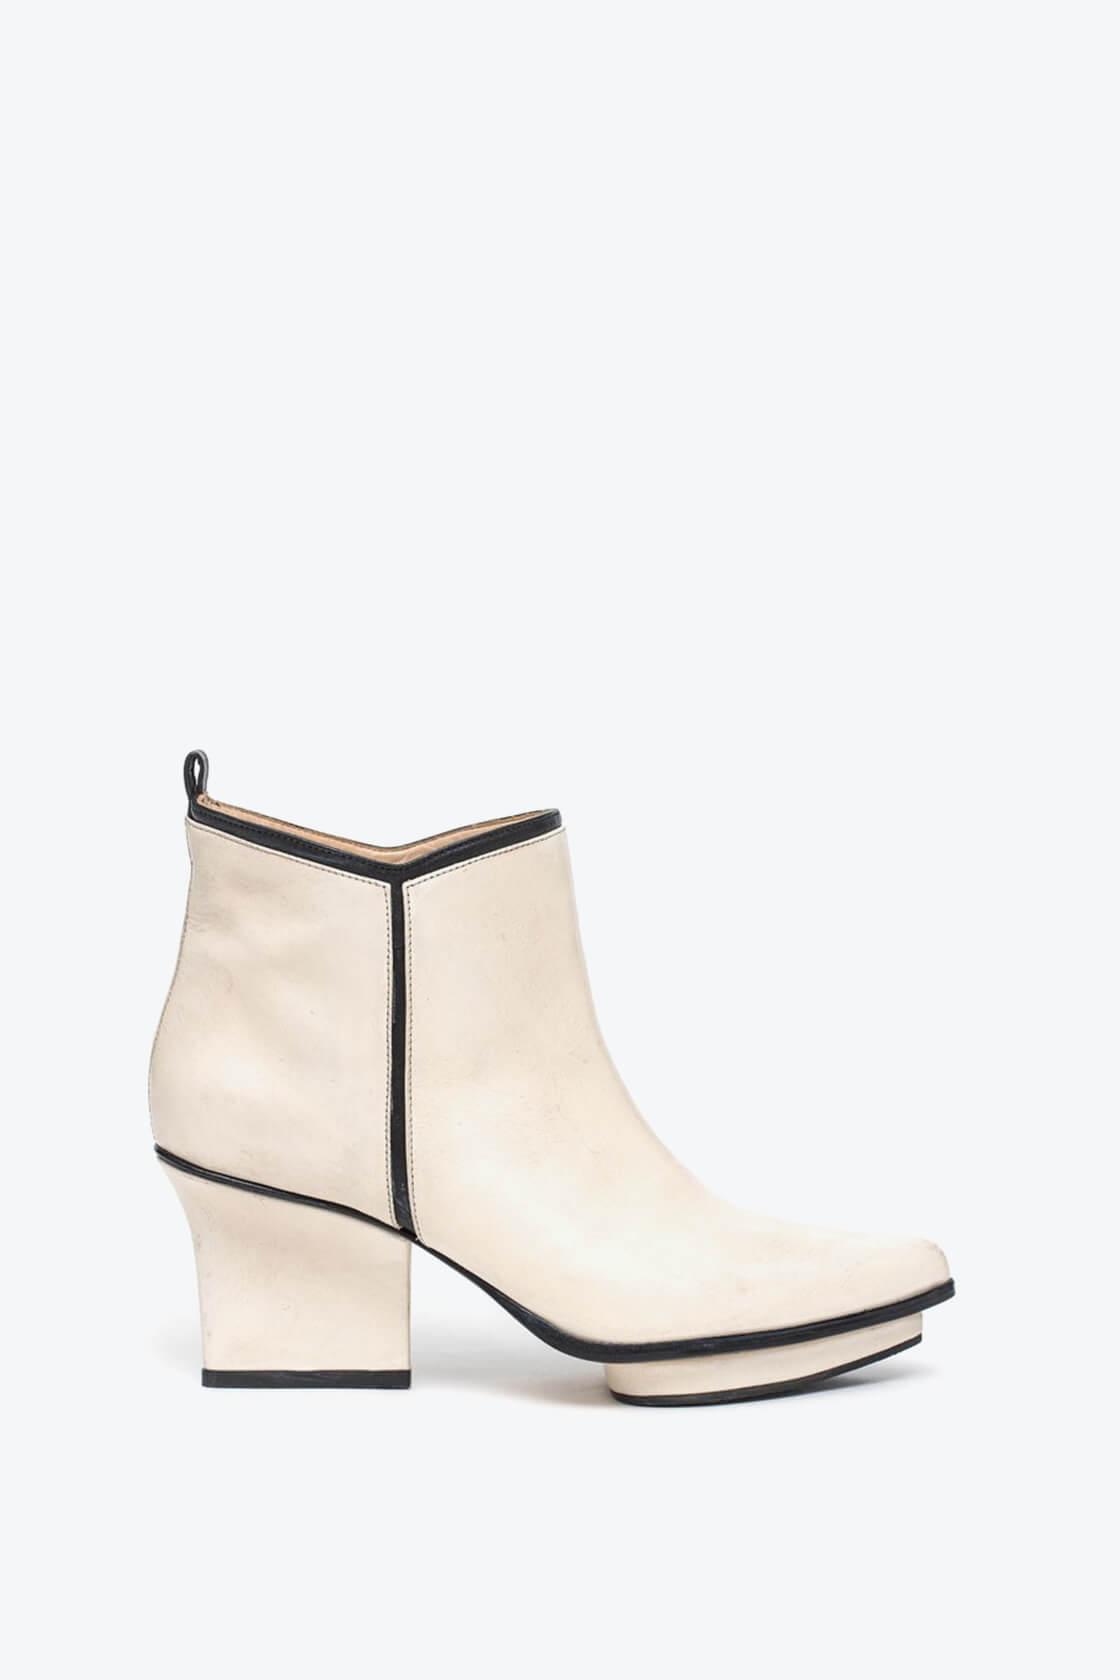 EJK0000003 Glenn ankle boots cream 1